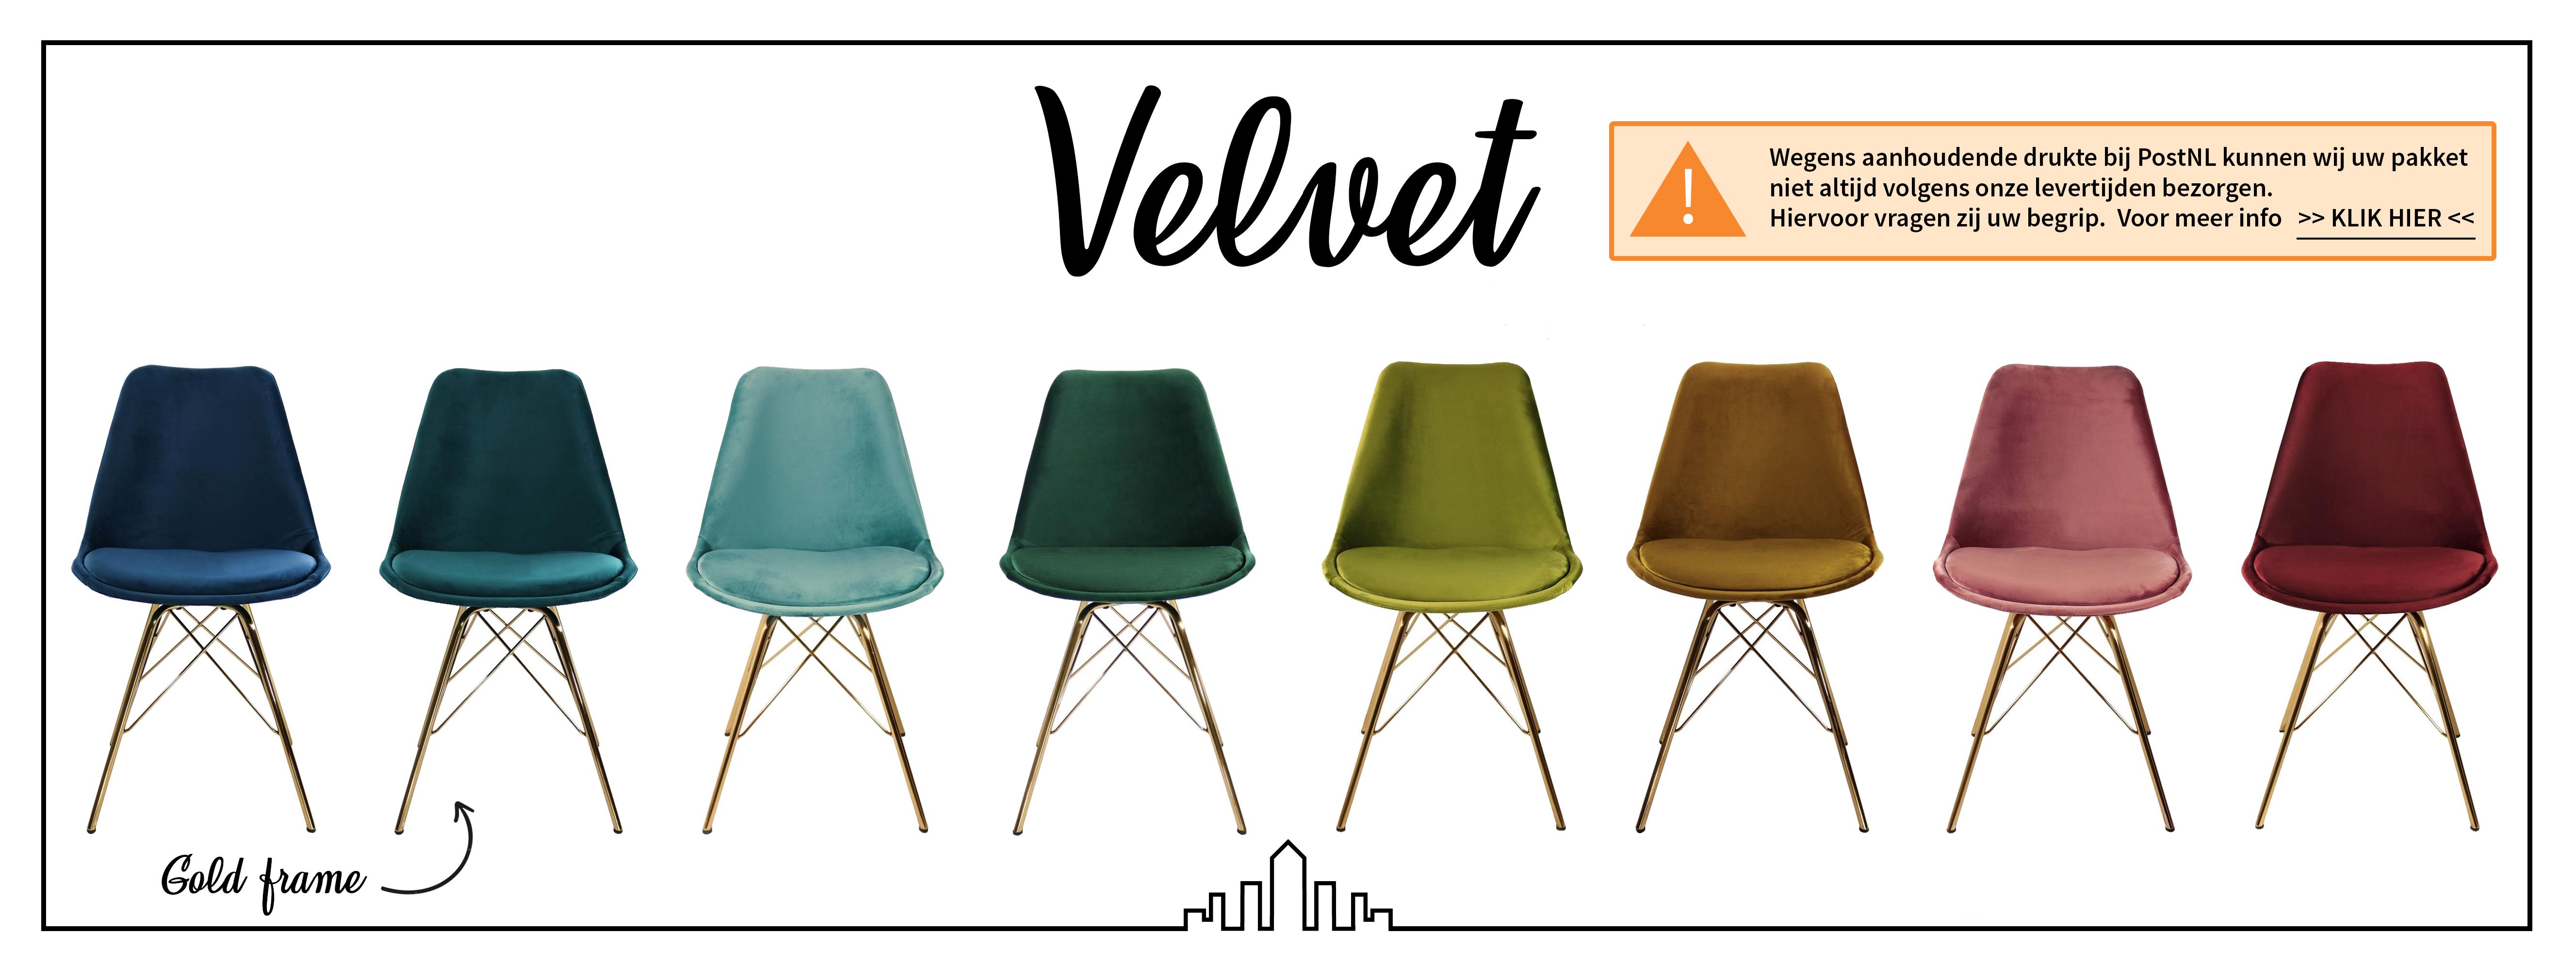 Kick eetkamerstoel - Velvet